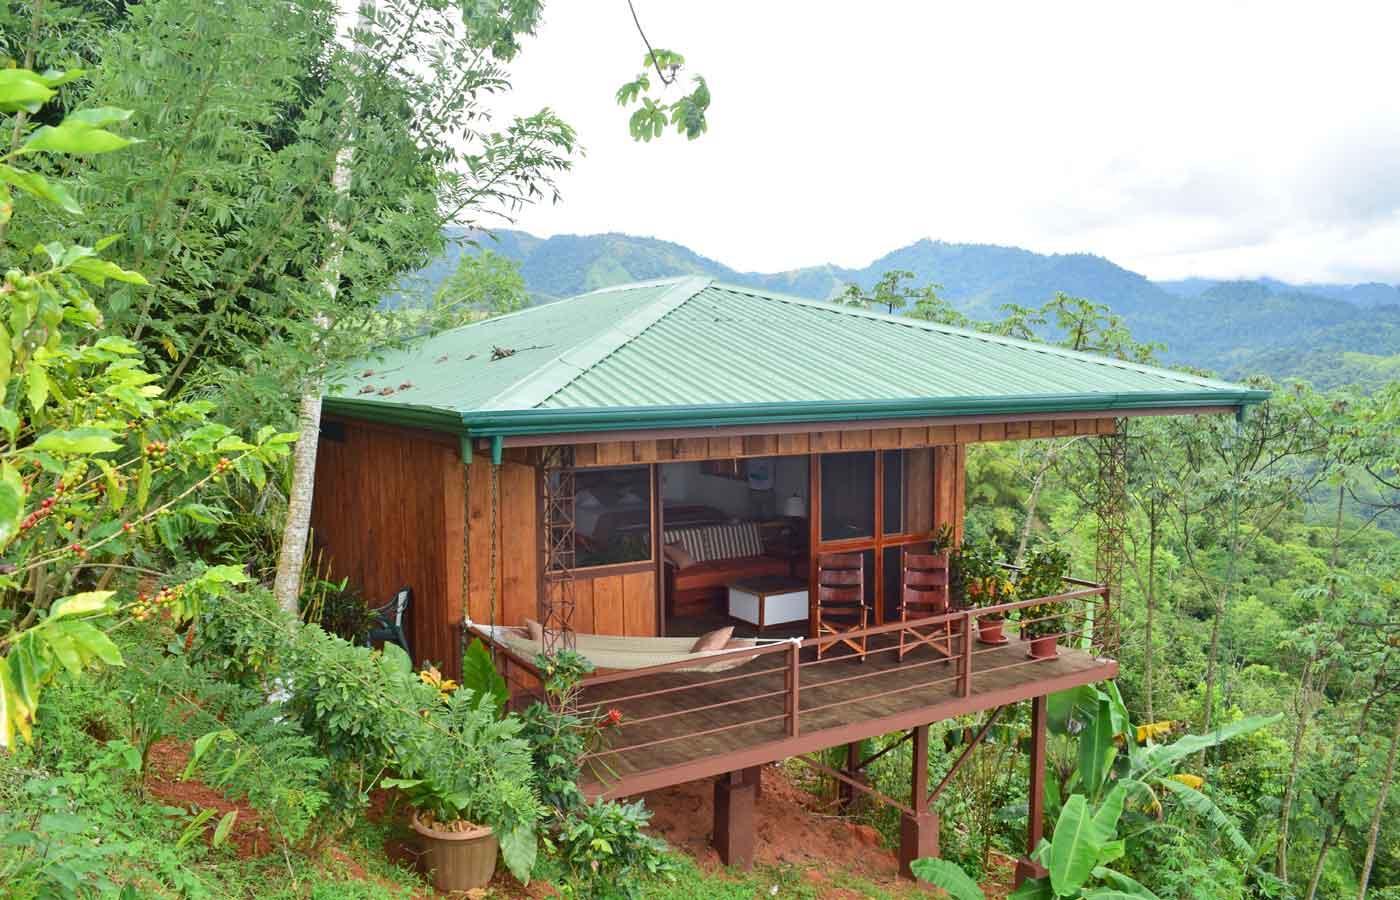 Santa Juana Lodge, Naranjito, Costa Rica